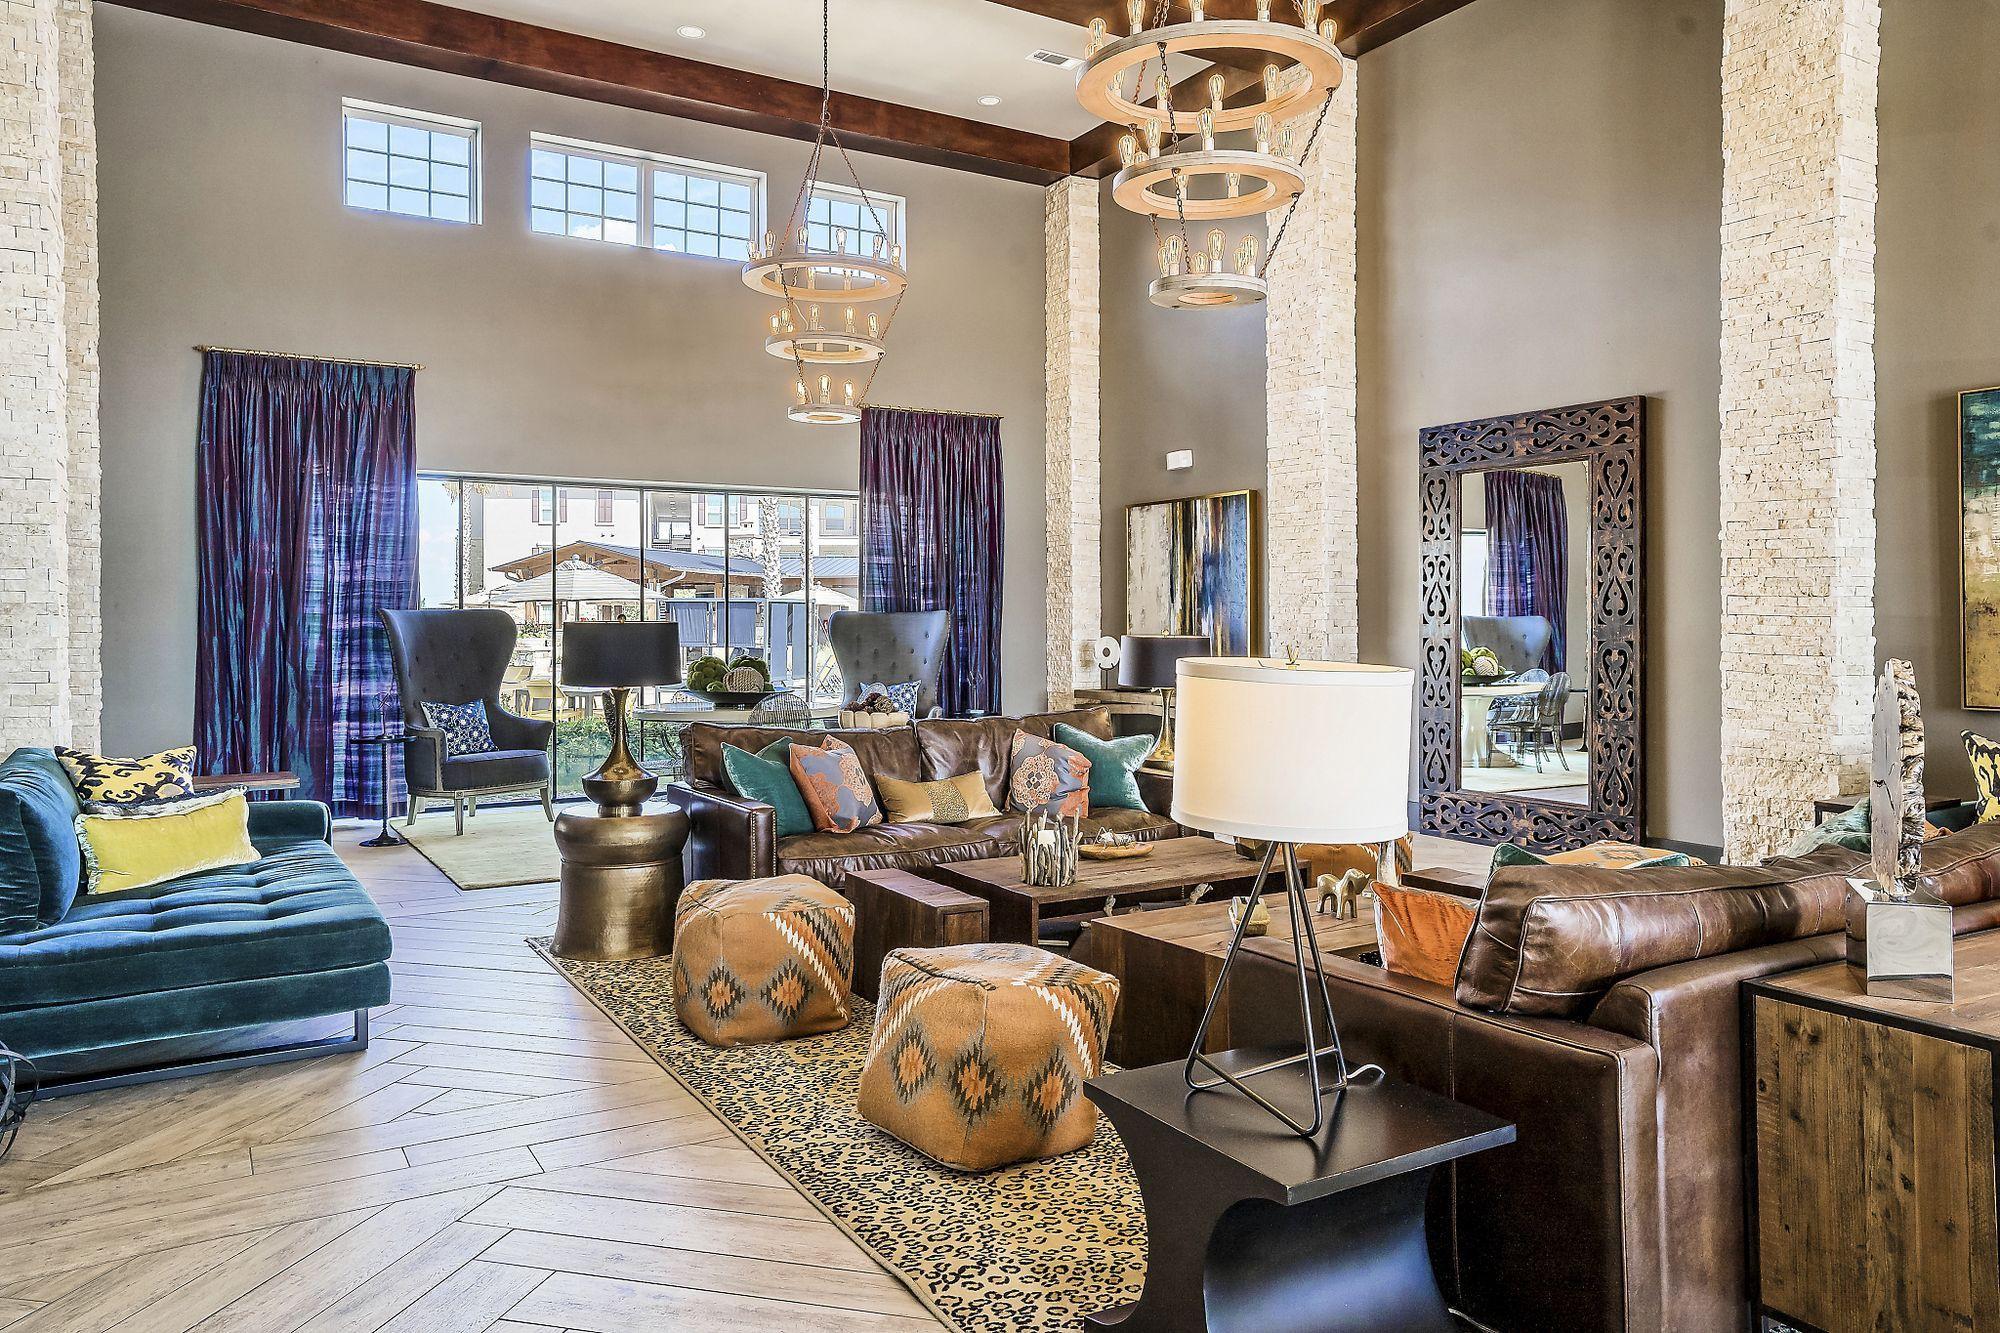 Apartments Near Midland College Sundance Creek for Midland College Students in Midland, TX